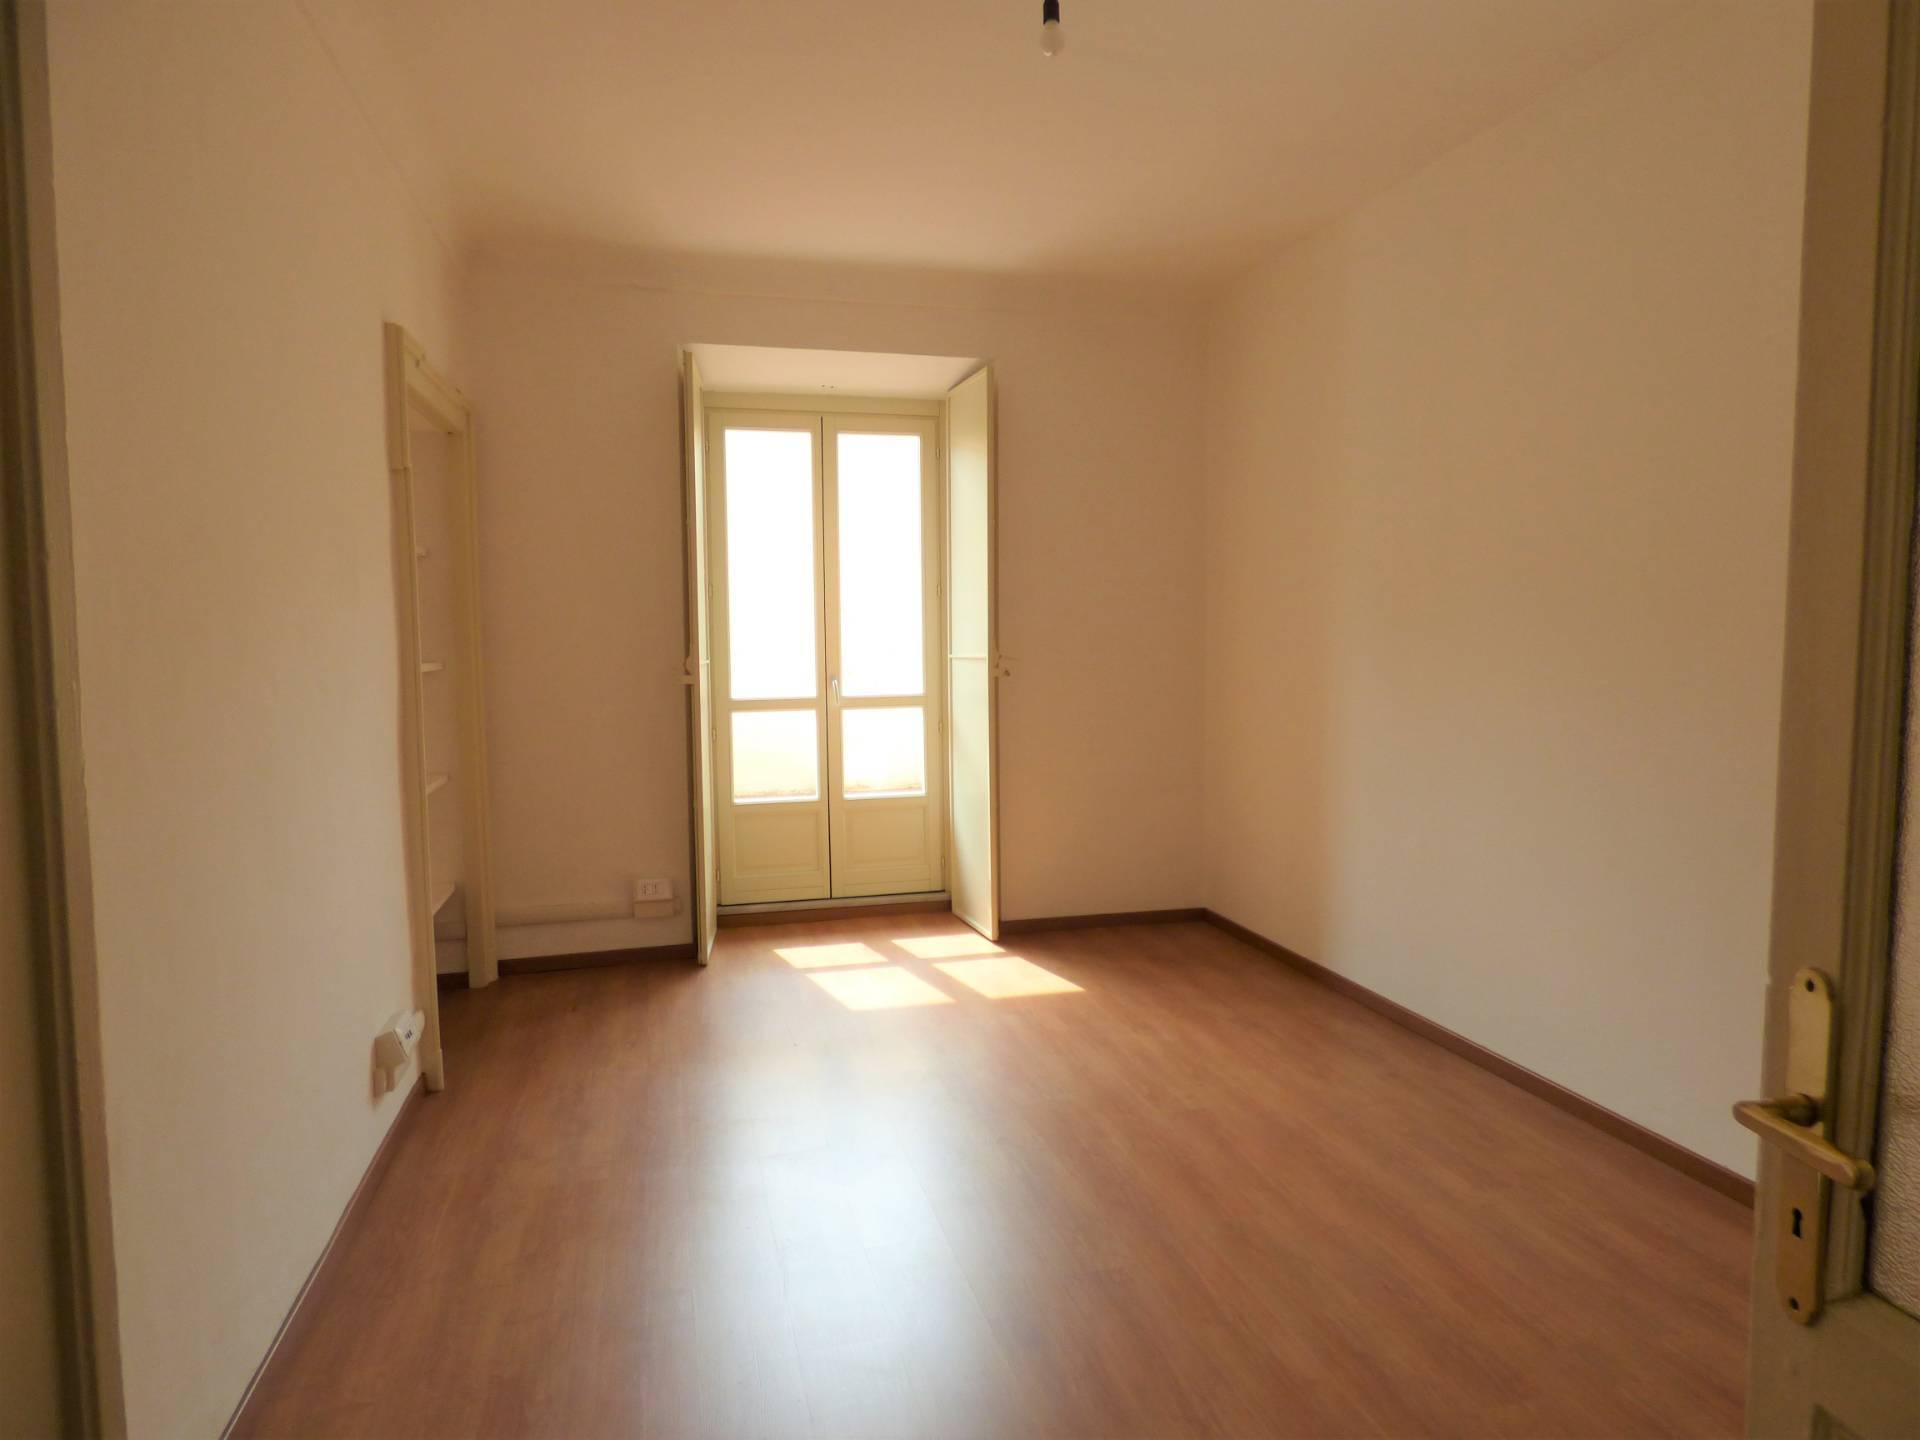 Ufficio in affitto a Cuneo (CN)